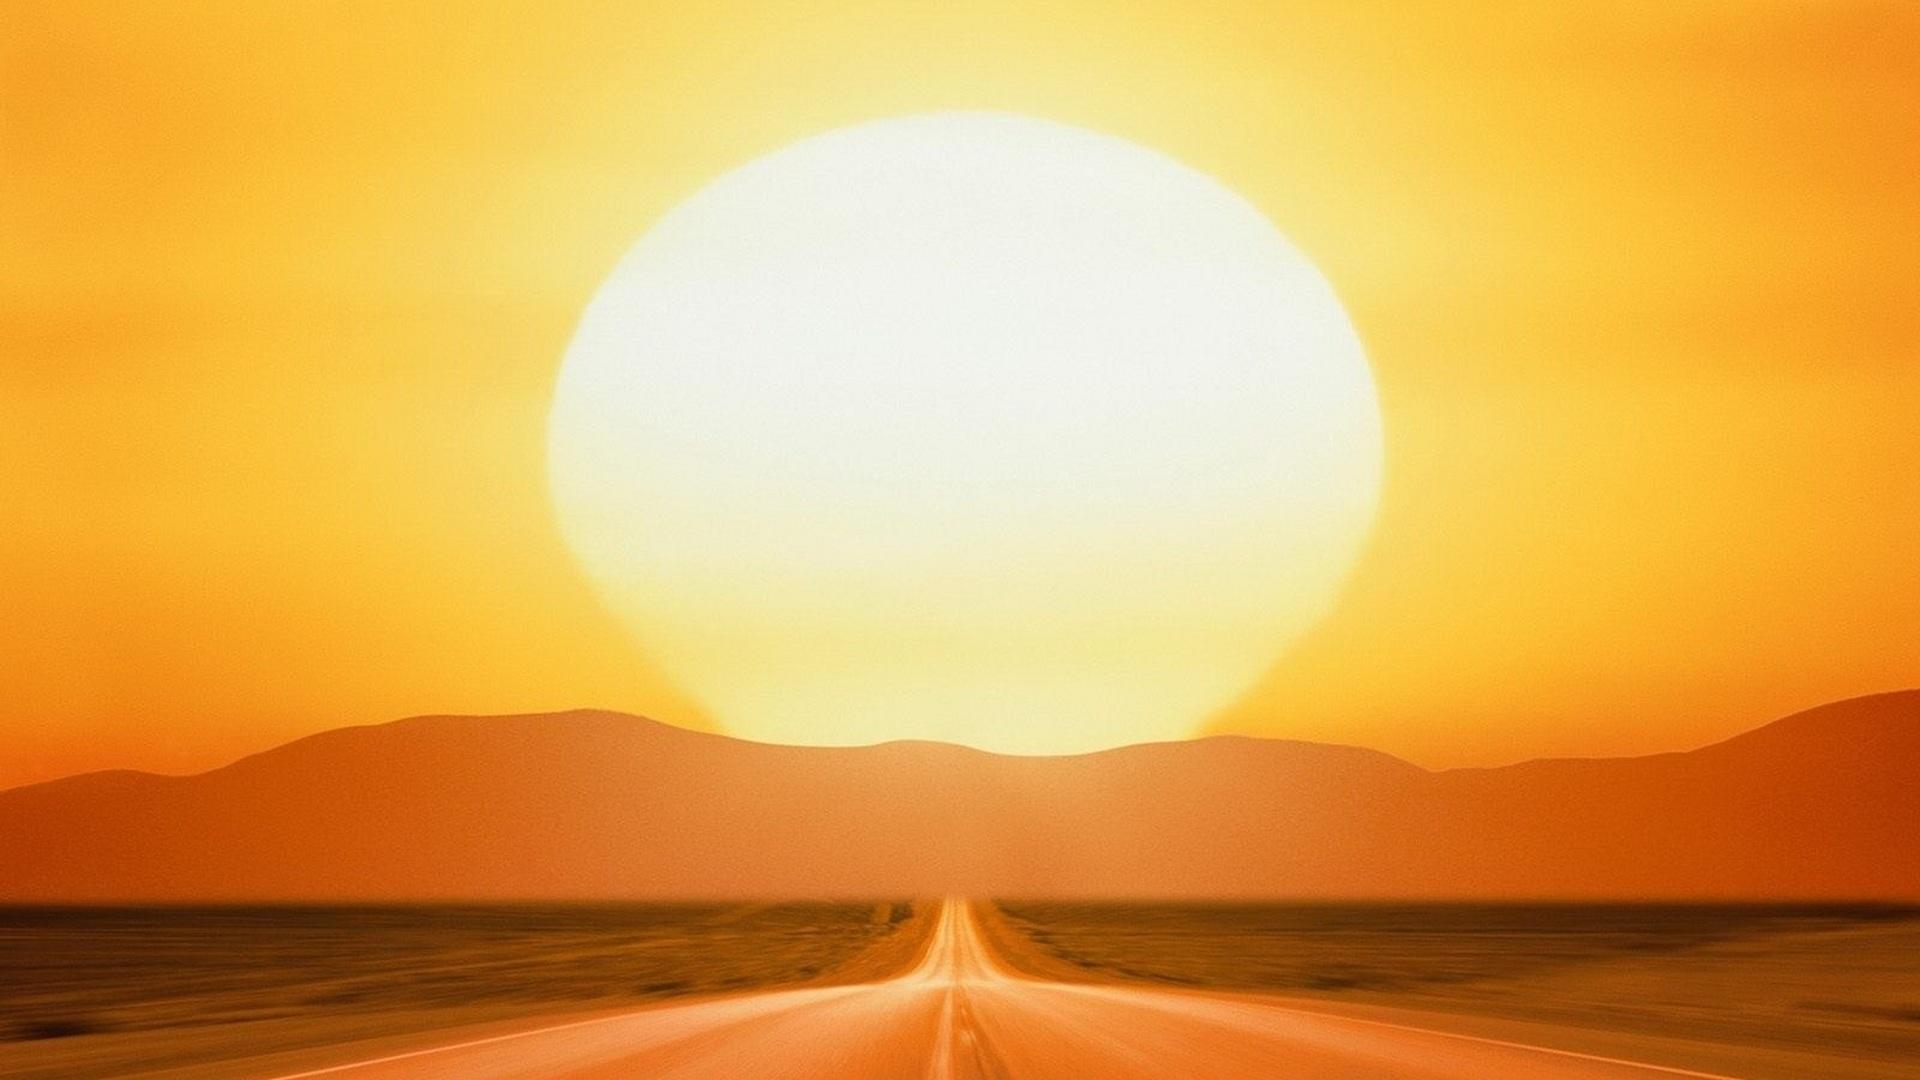 Уходящее солнце